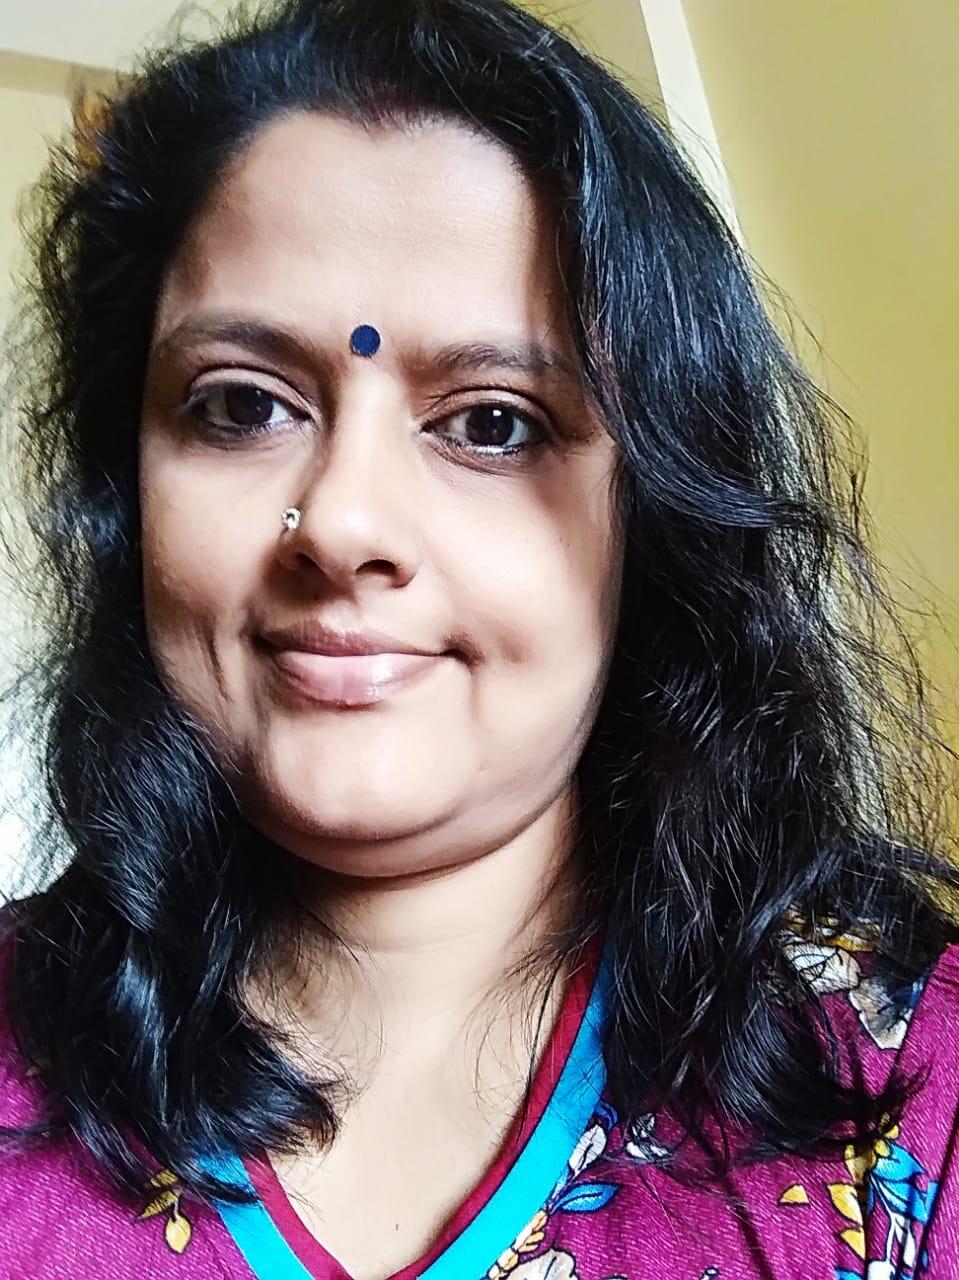 Snighda Gupta